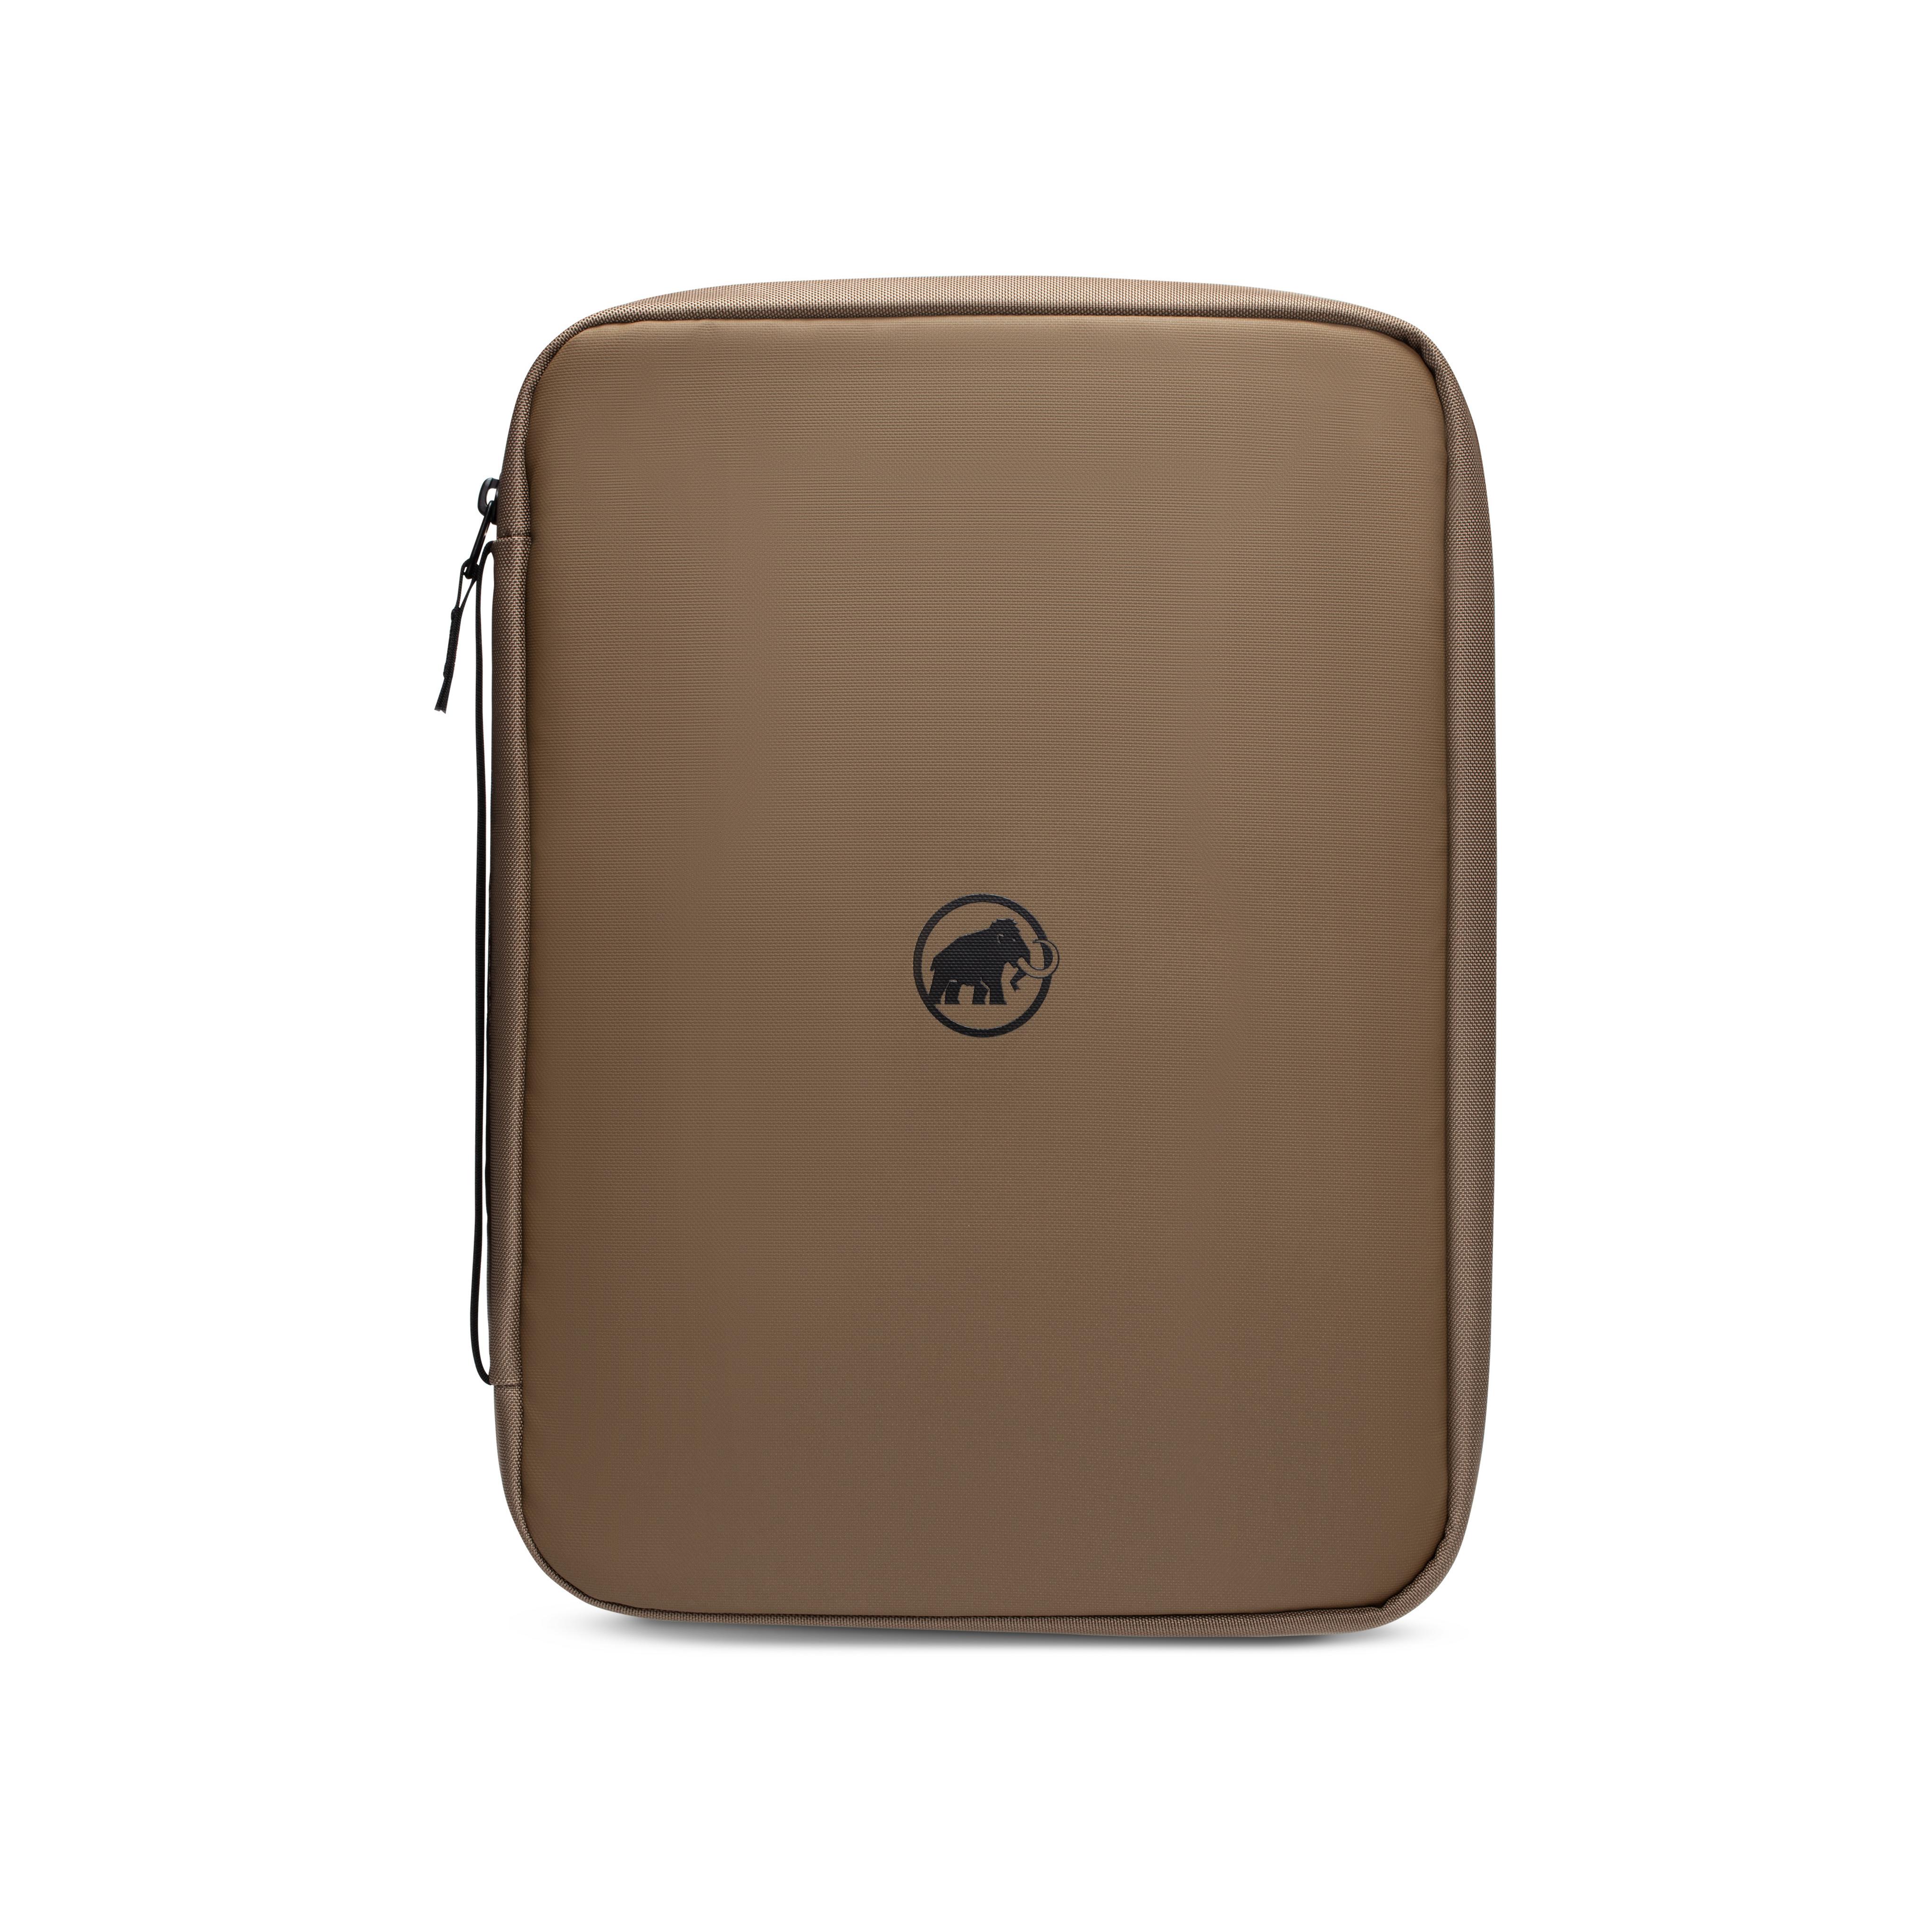 Seon Laptop Case - dark clay, one size thumbnail